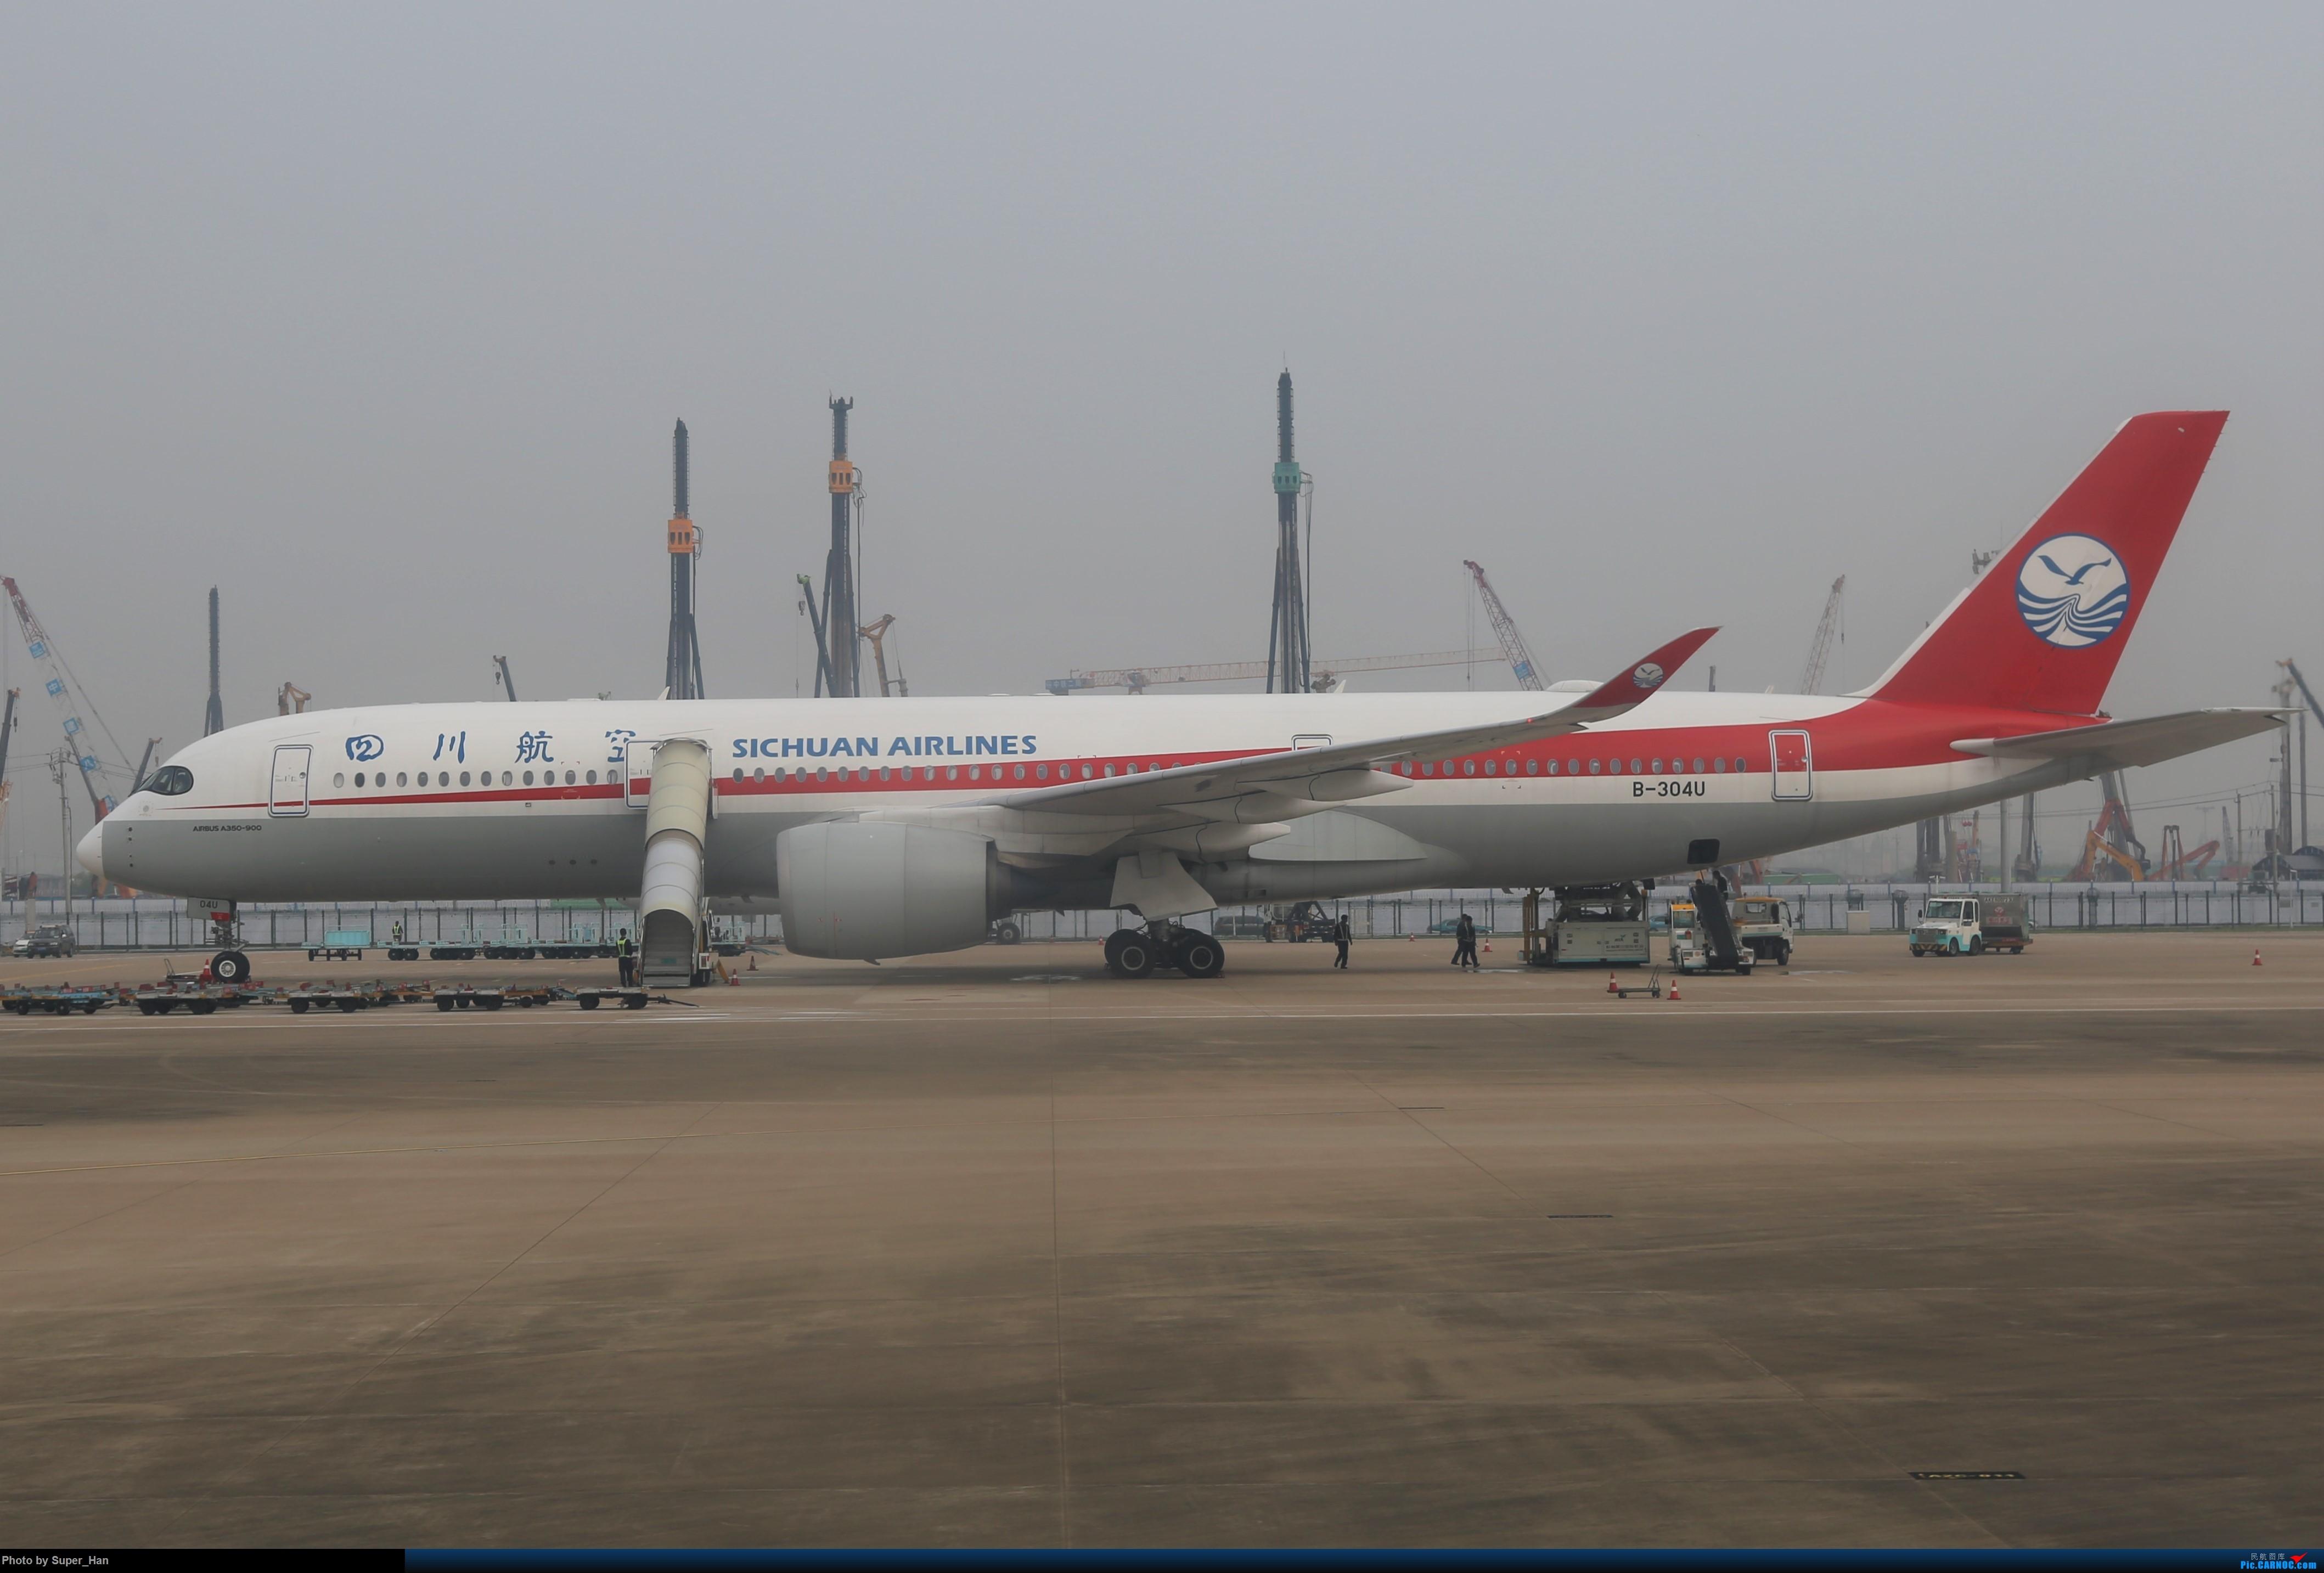 Re:[原创]0831初访XMN AIRBUS A350-900 B-304U 中国杭州萧山国际机场